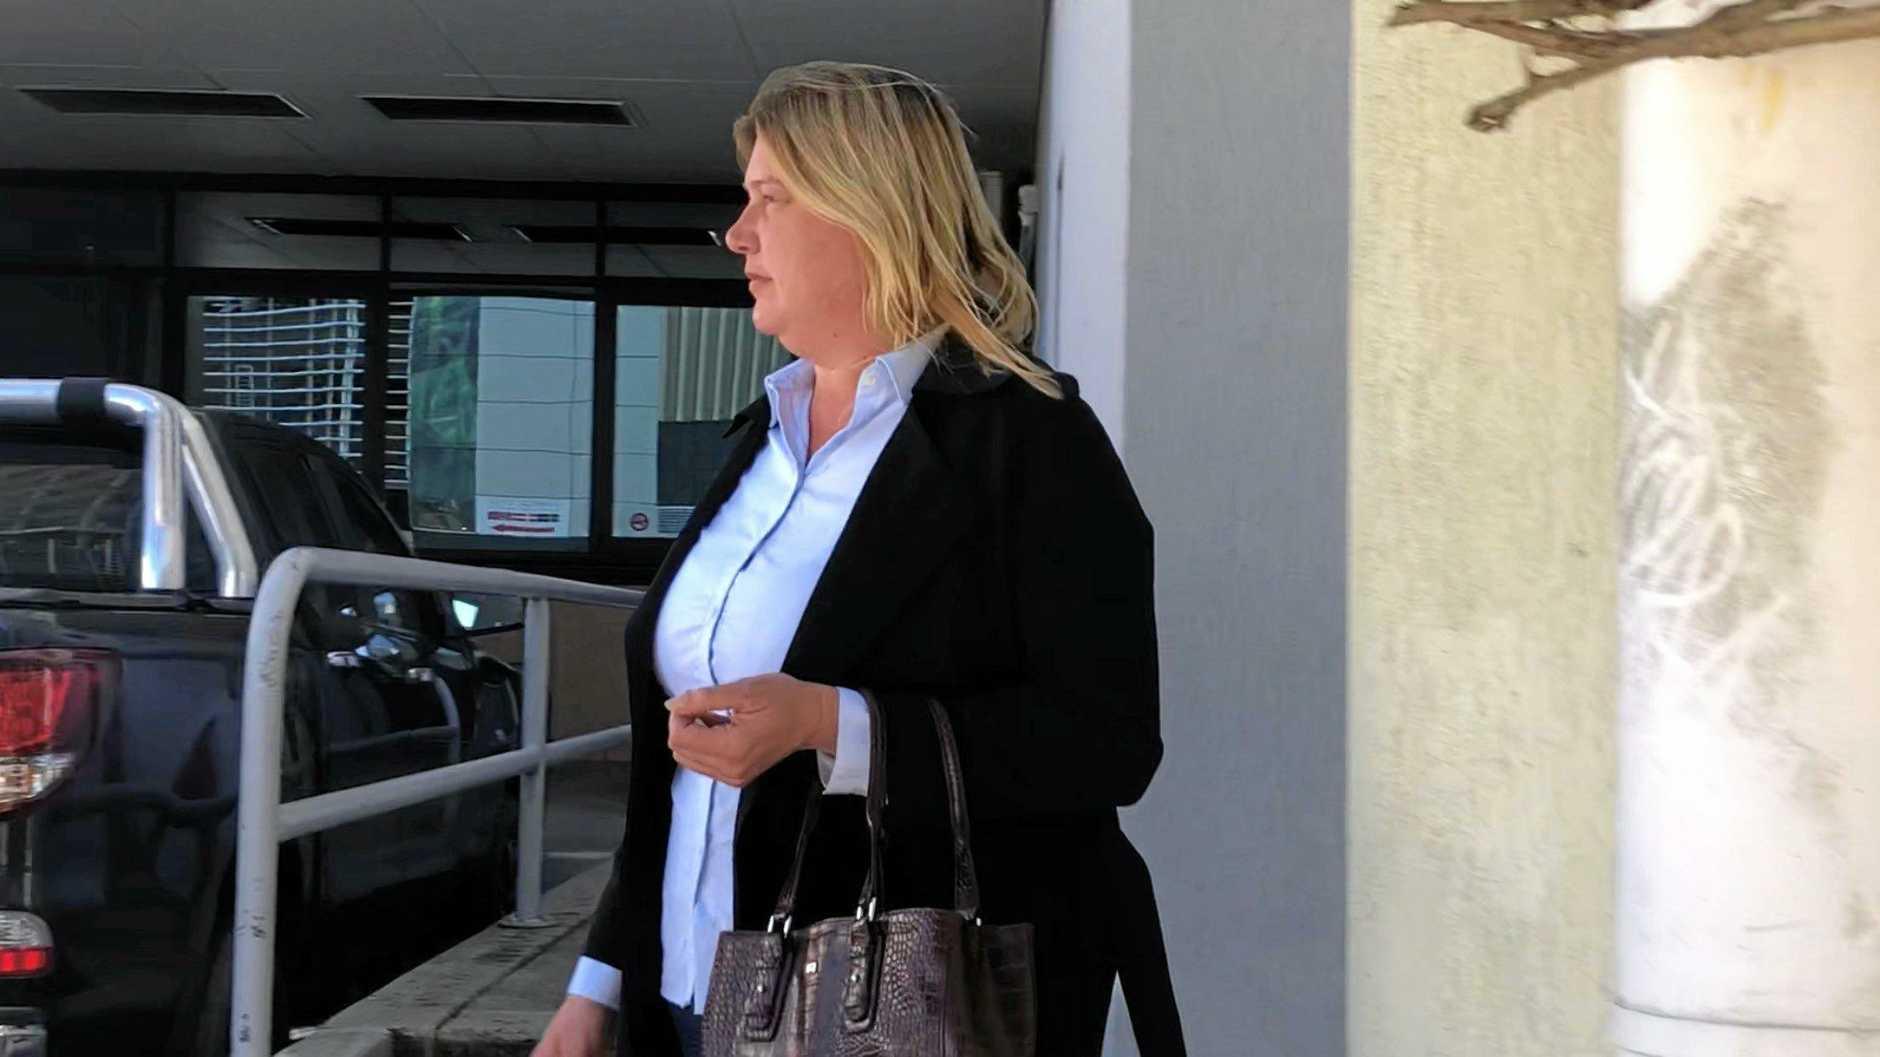 Monique Louise Schwartz pleaded not guilty to unlawfully assaulting a man near a Noosa nightclub last year.